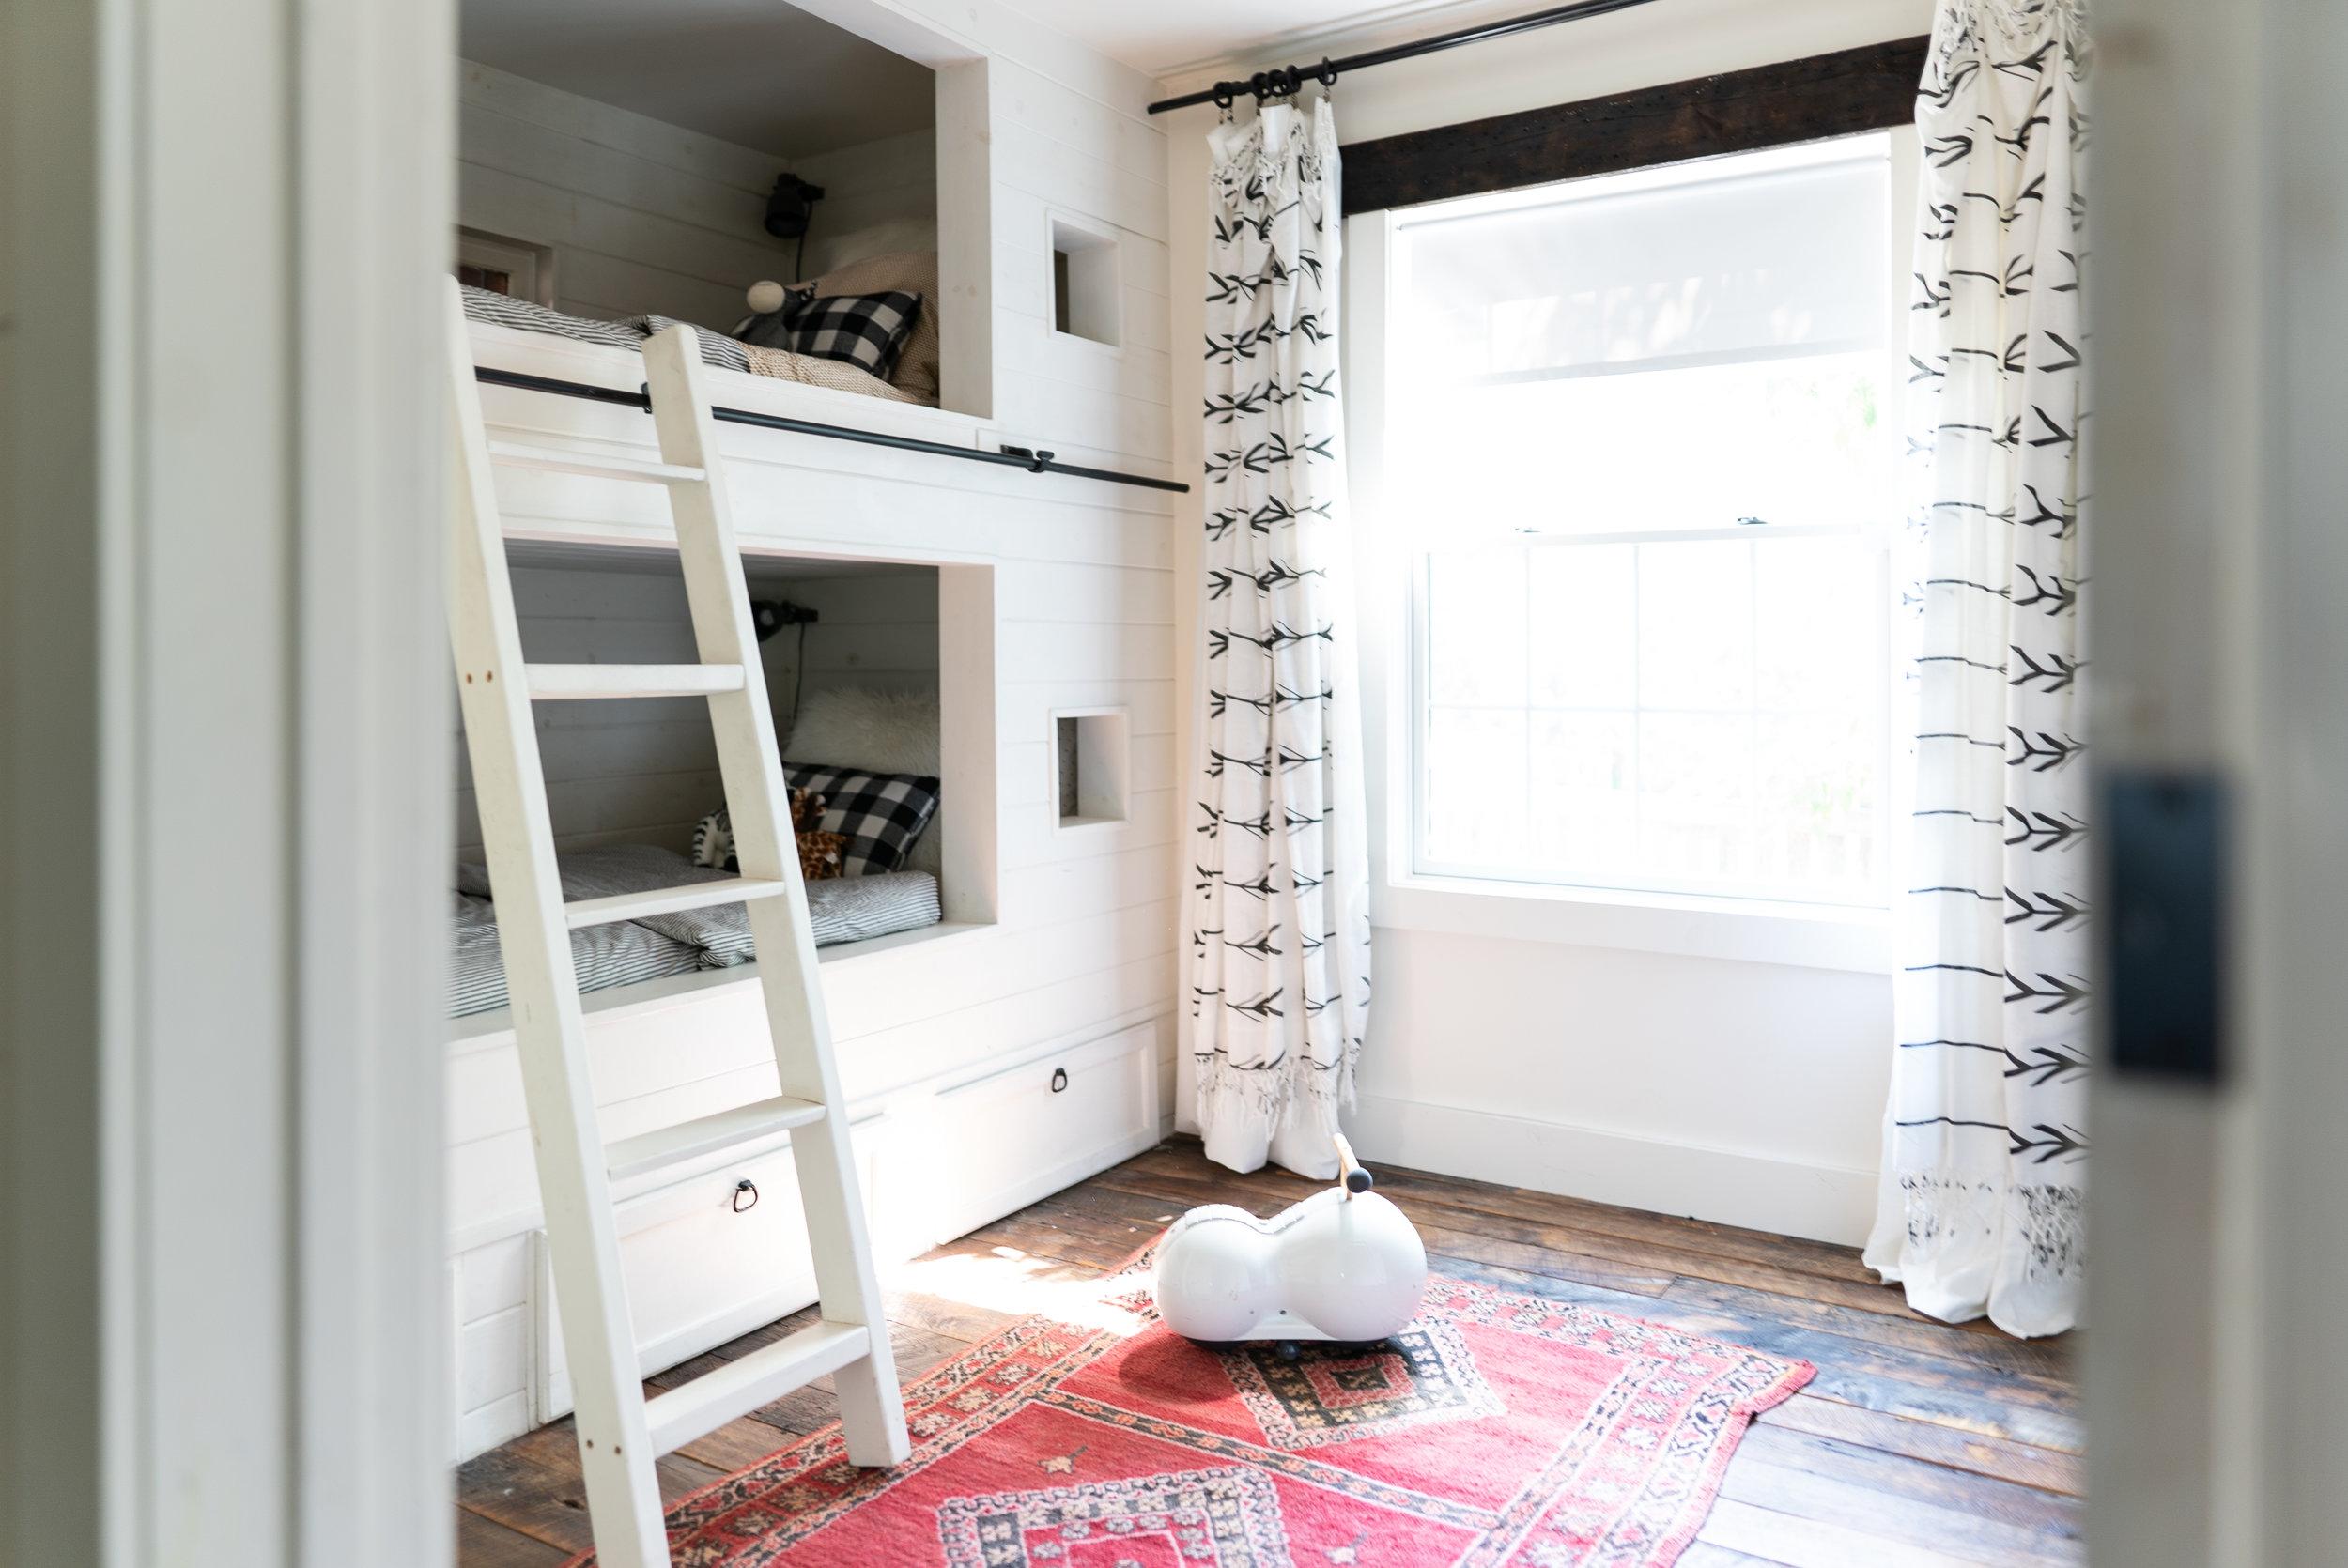 KF_Ollie room_from door horizontal-09345.jpg